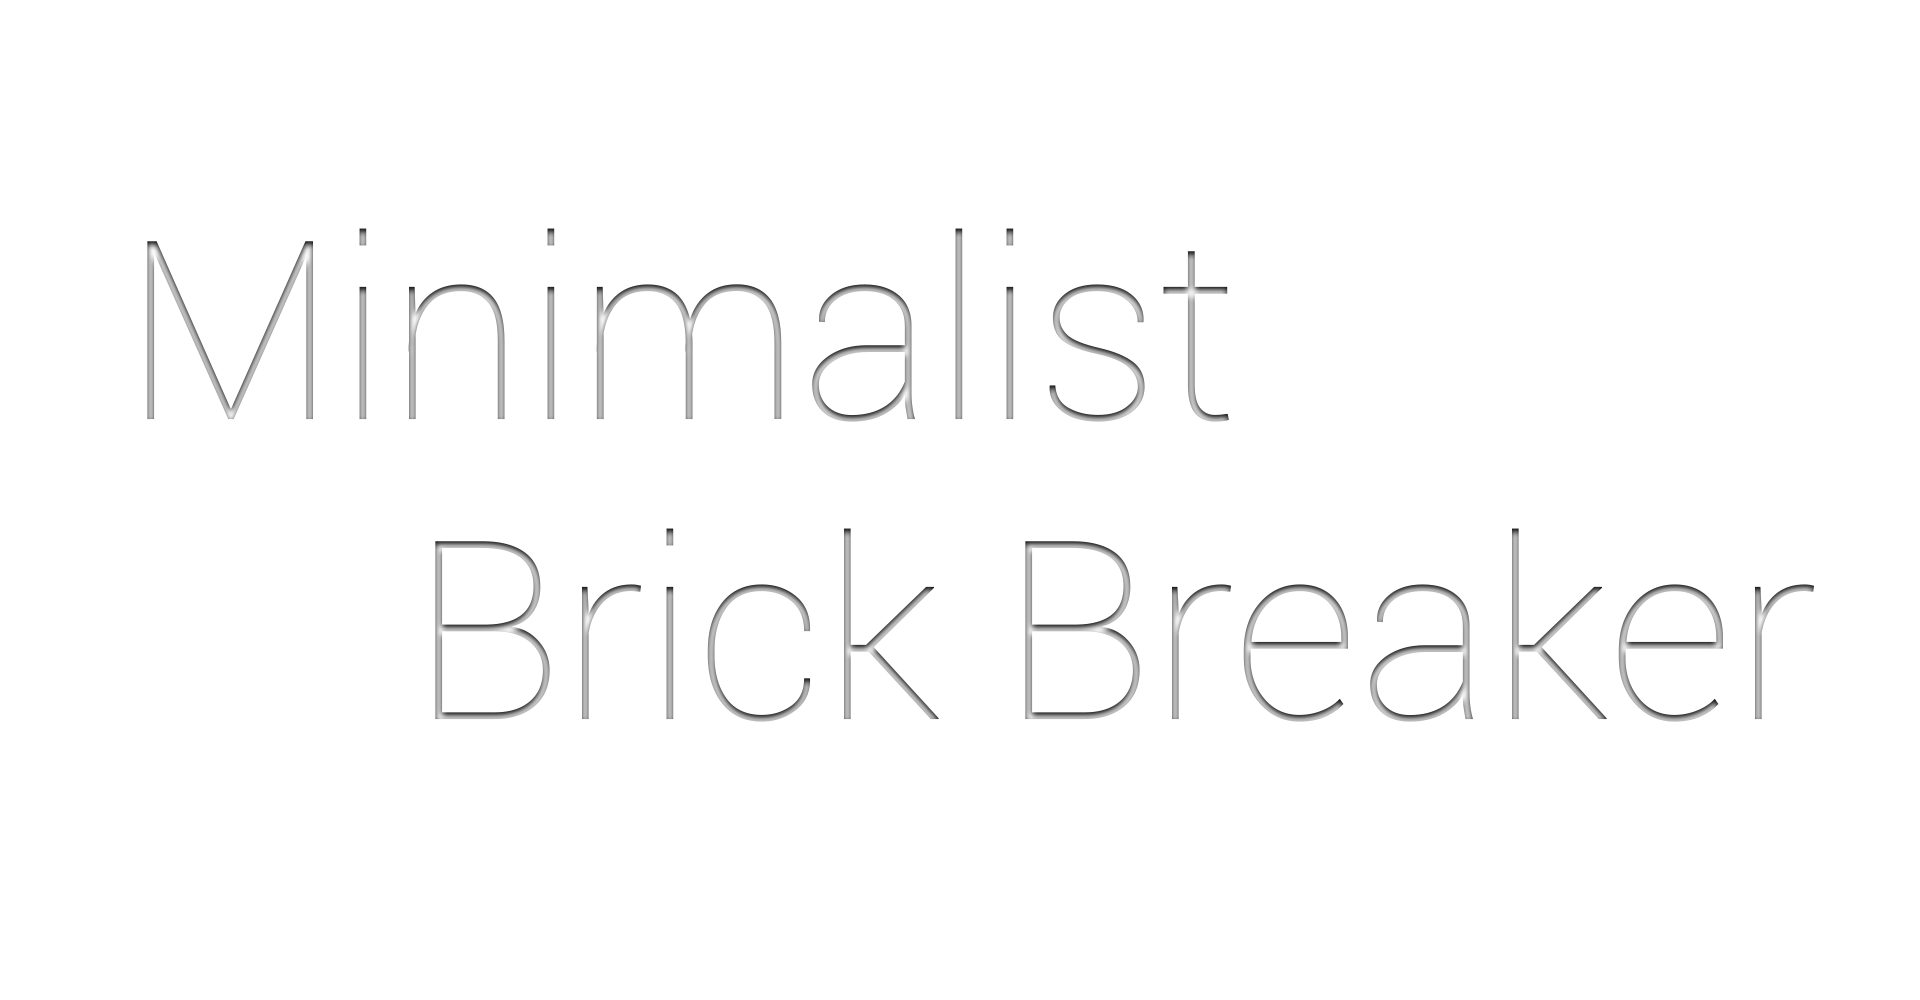 Minimalist Brick Breaker